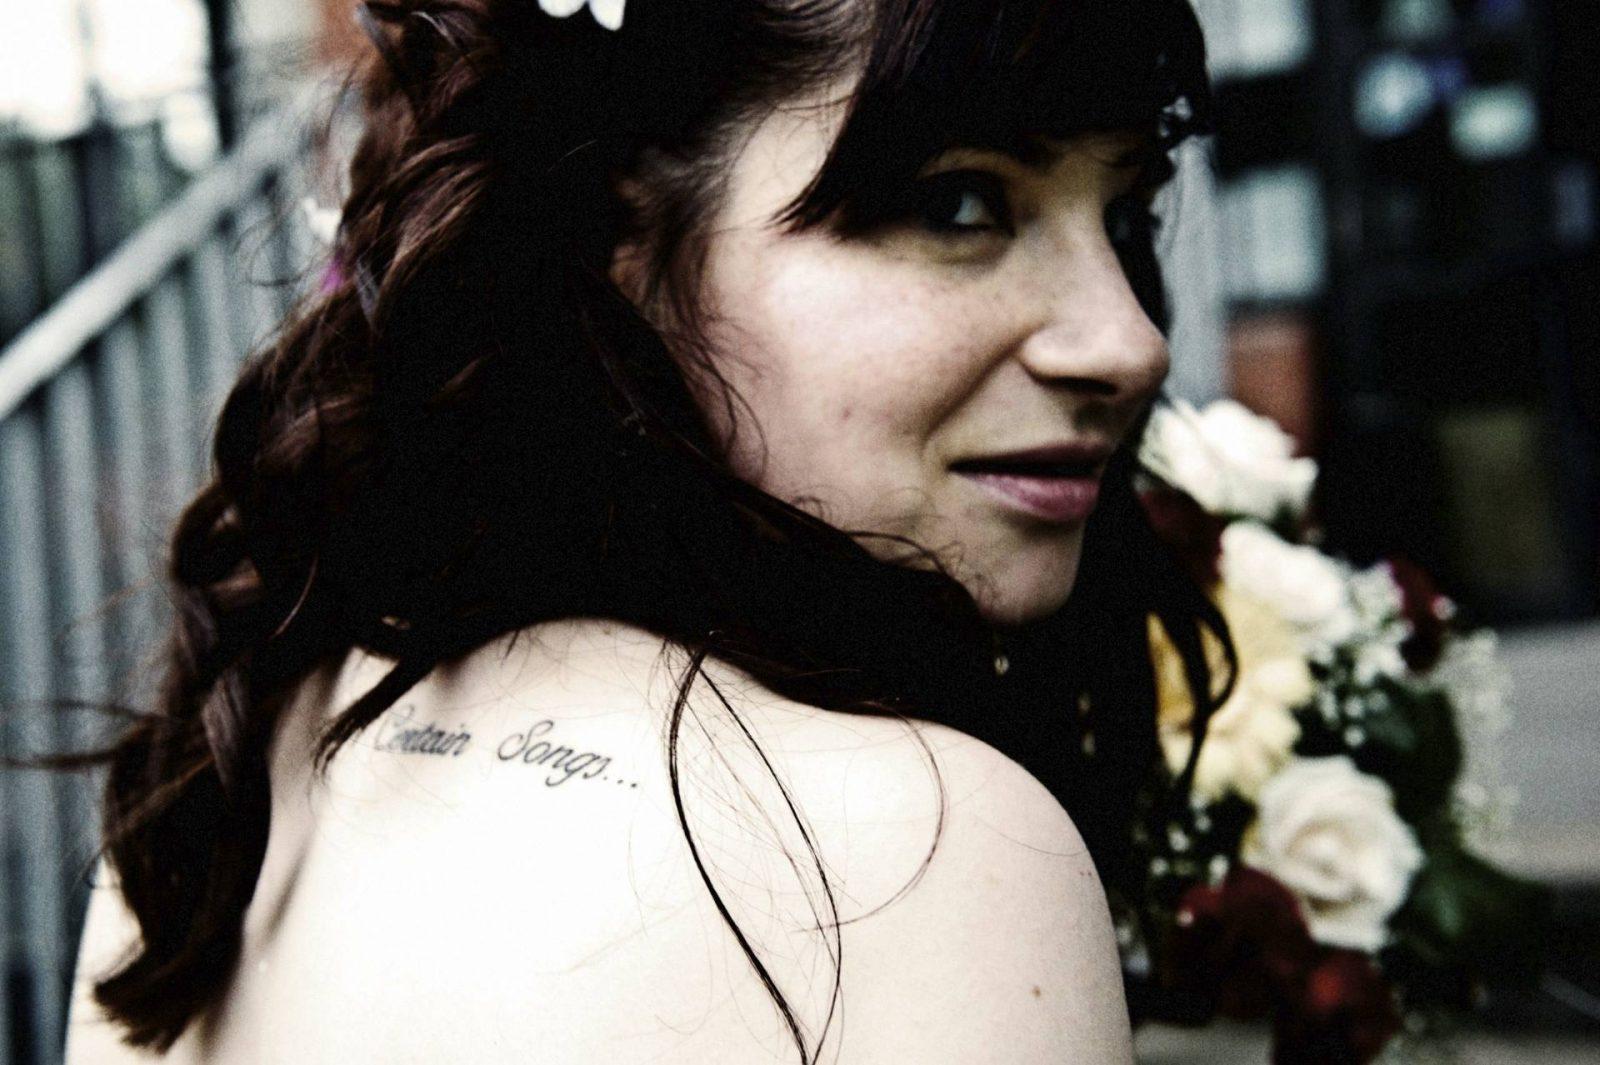 my monochrome tattoo tour;